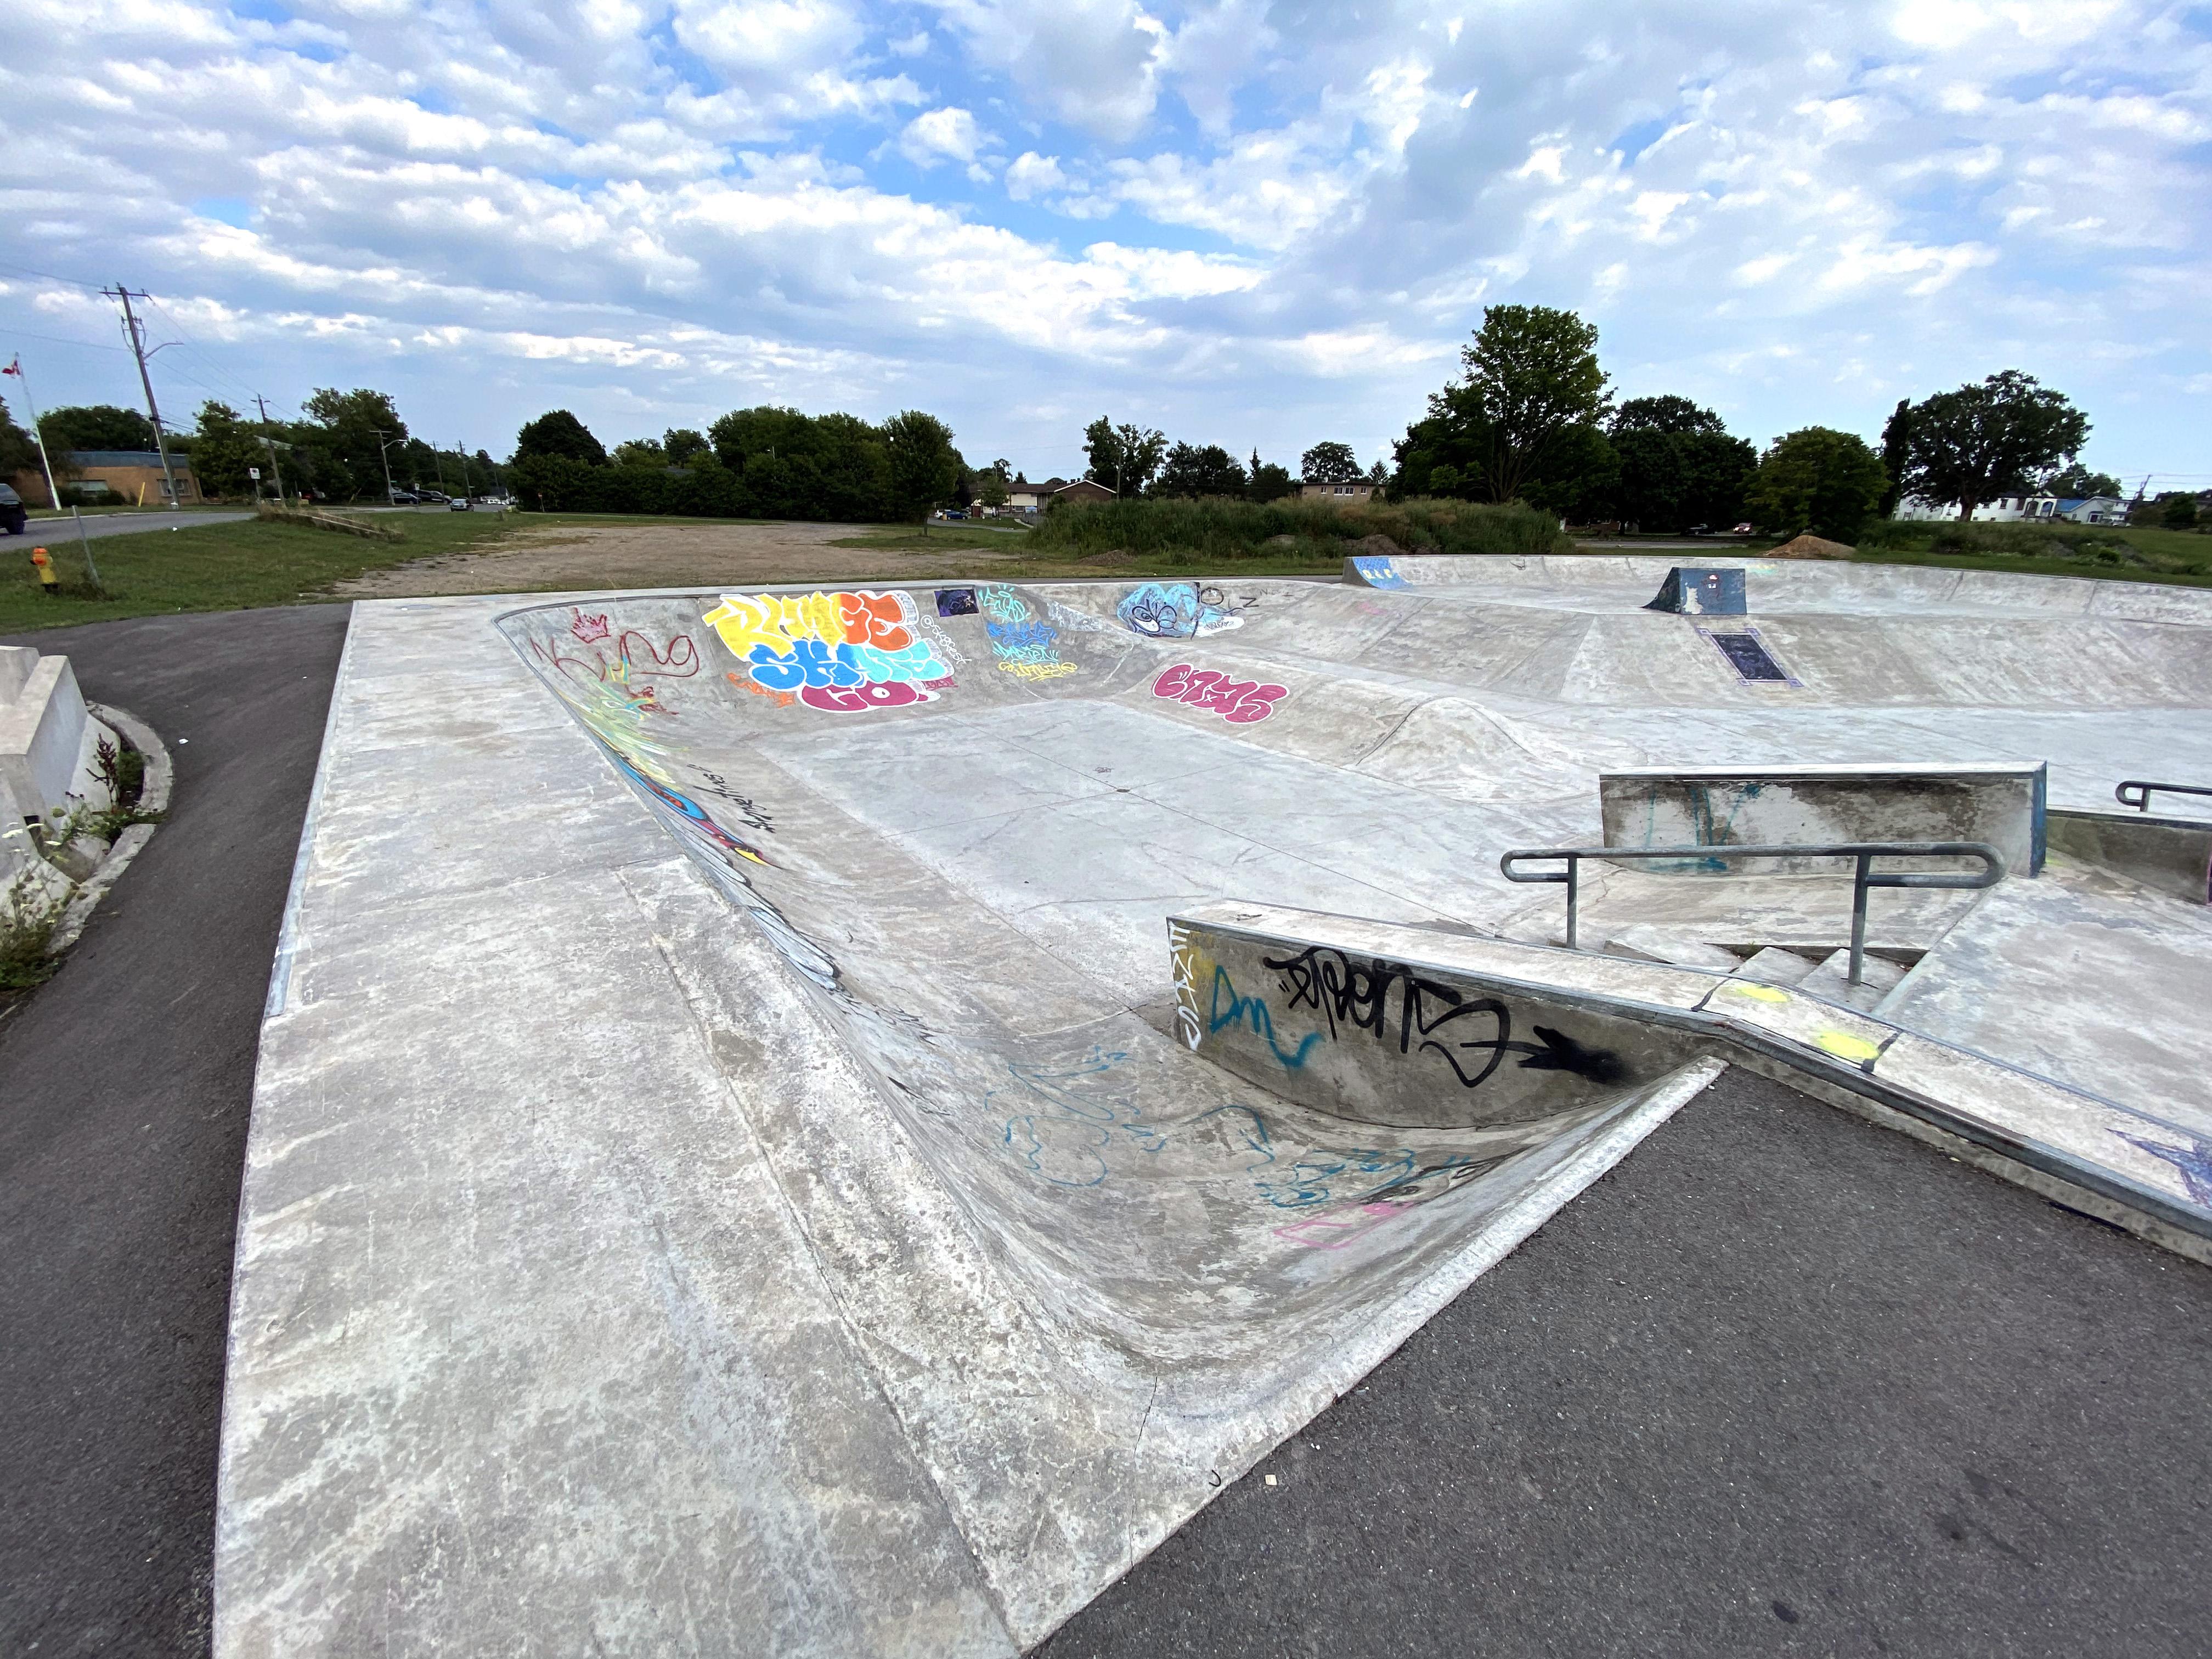 Daly Street Skatepark